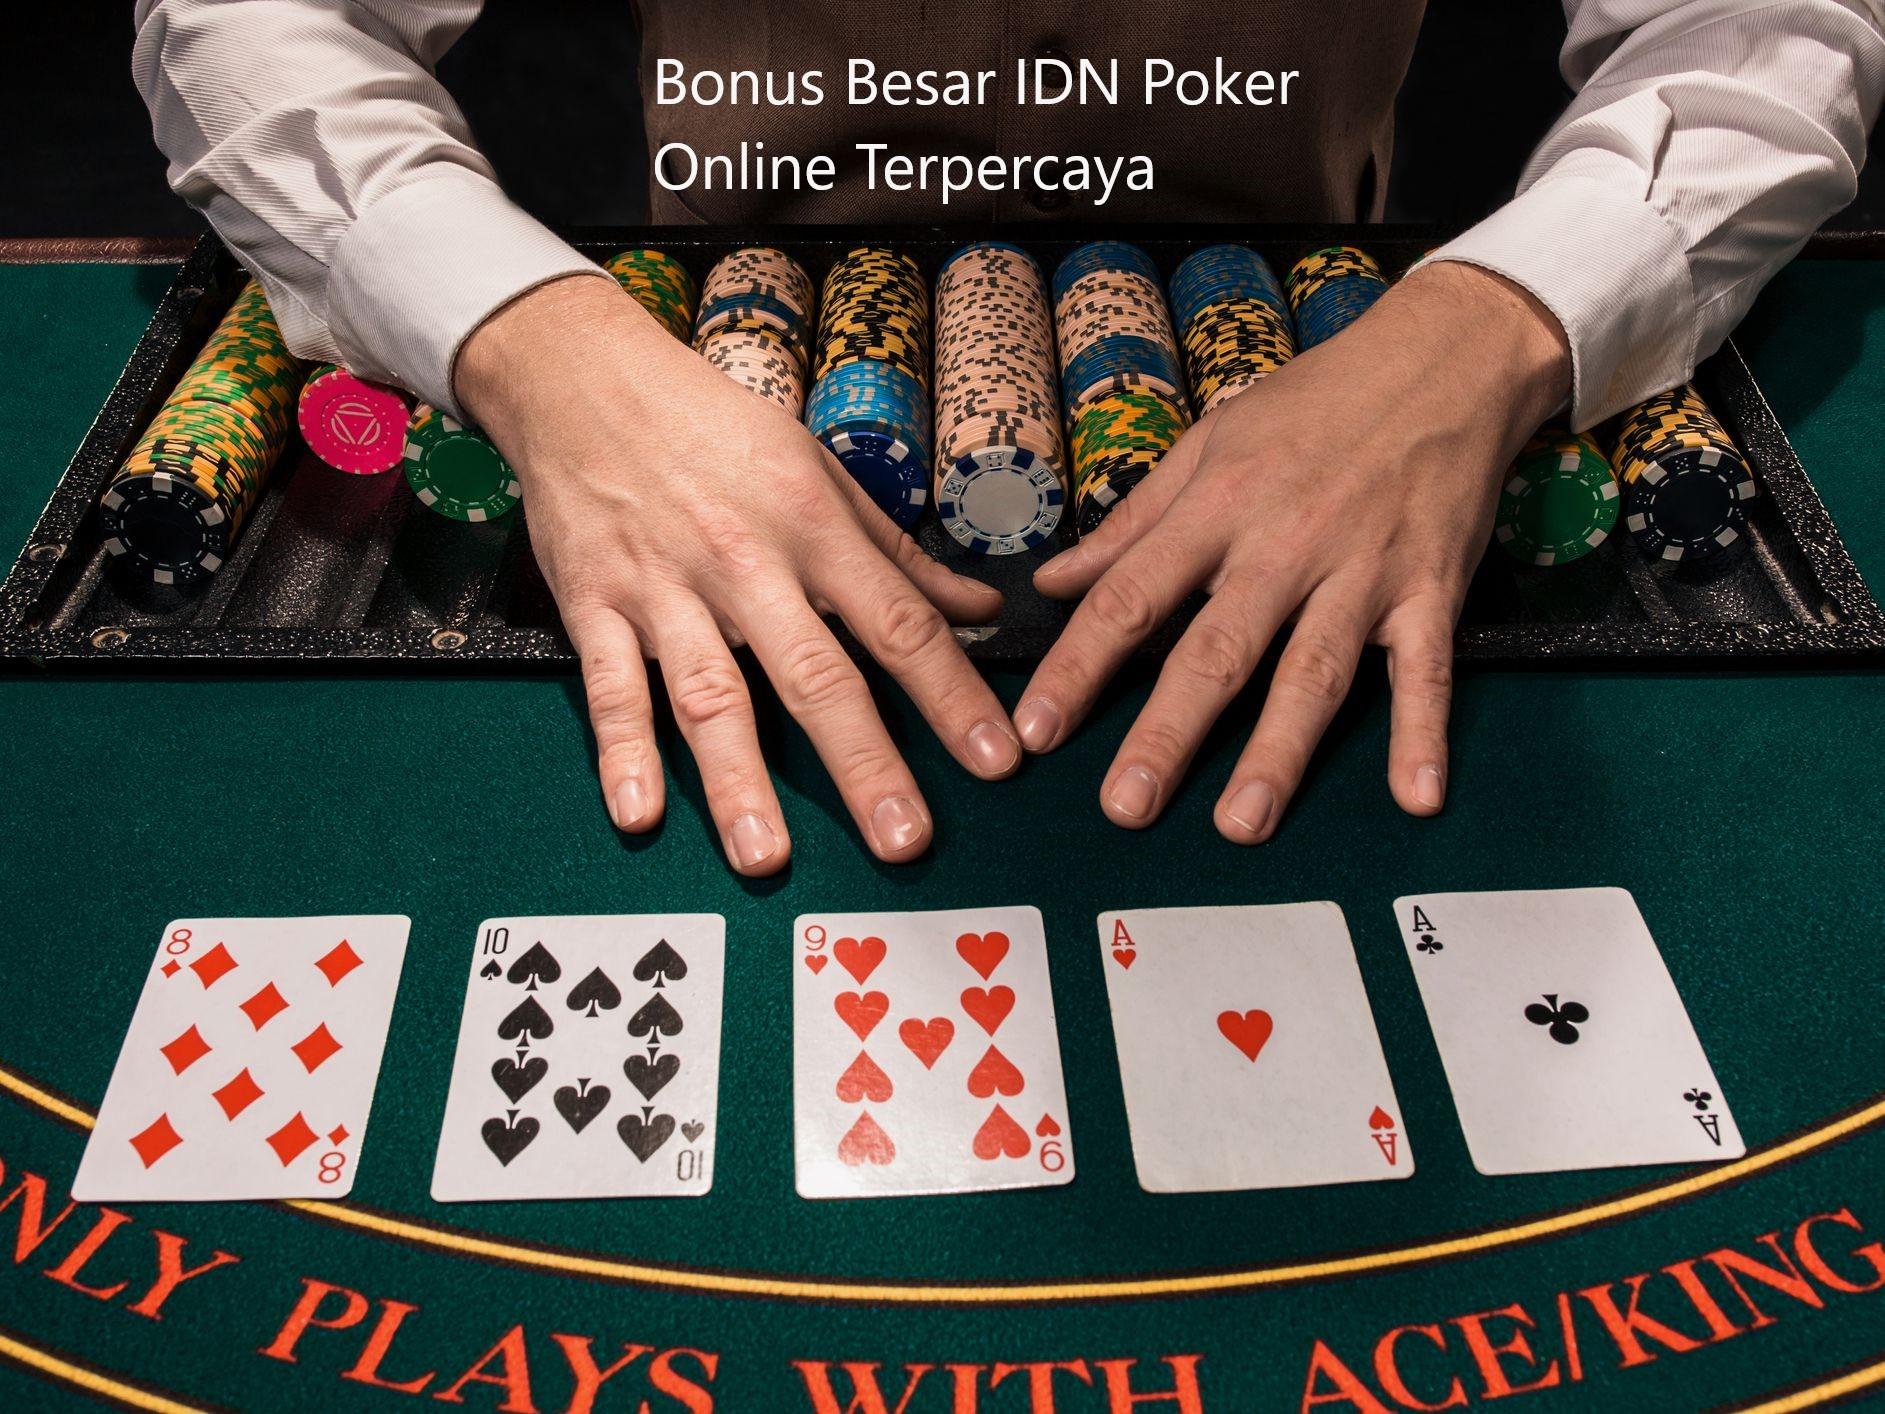 IDN Poker Online Indonesia